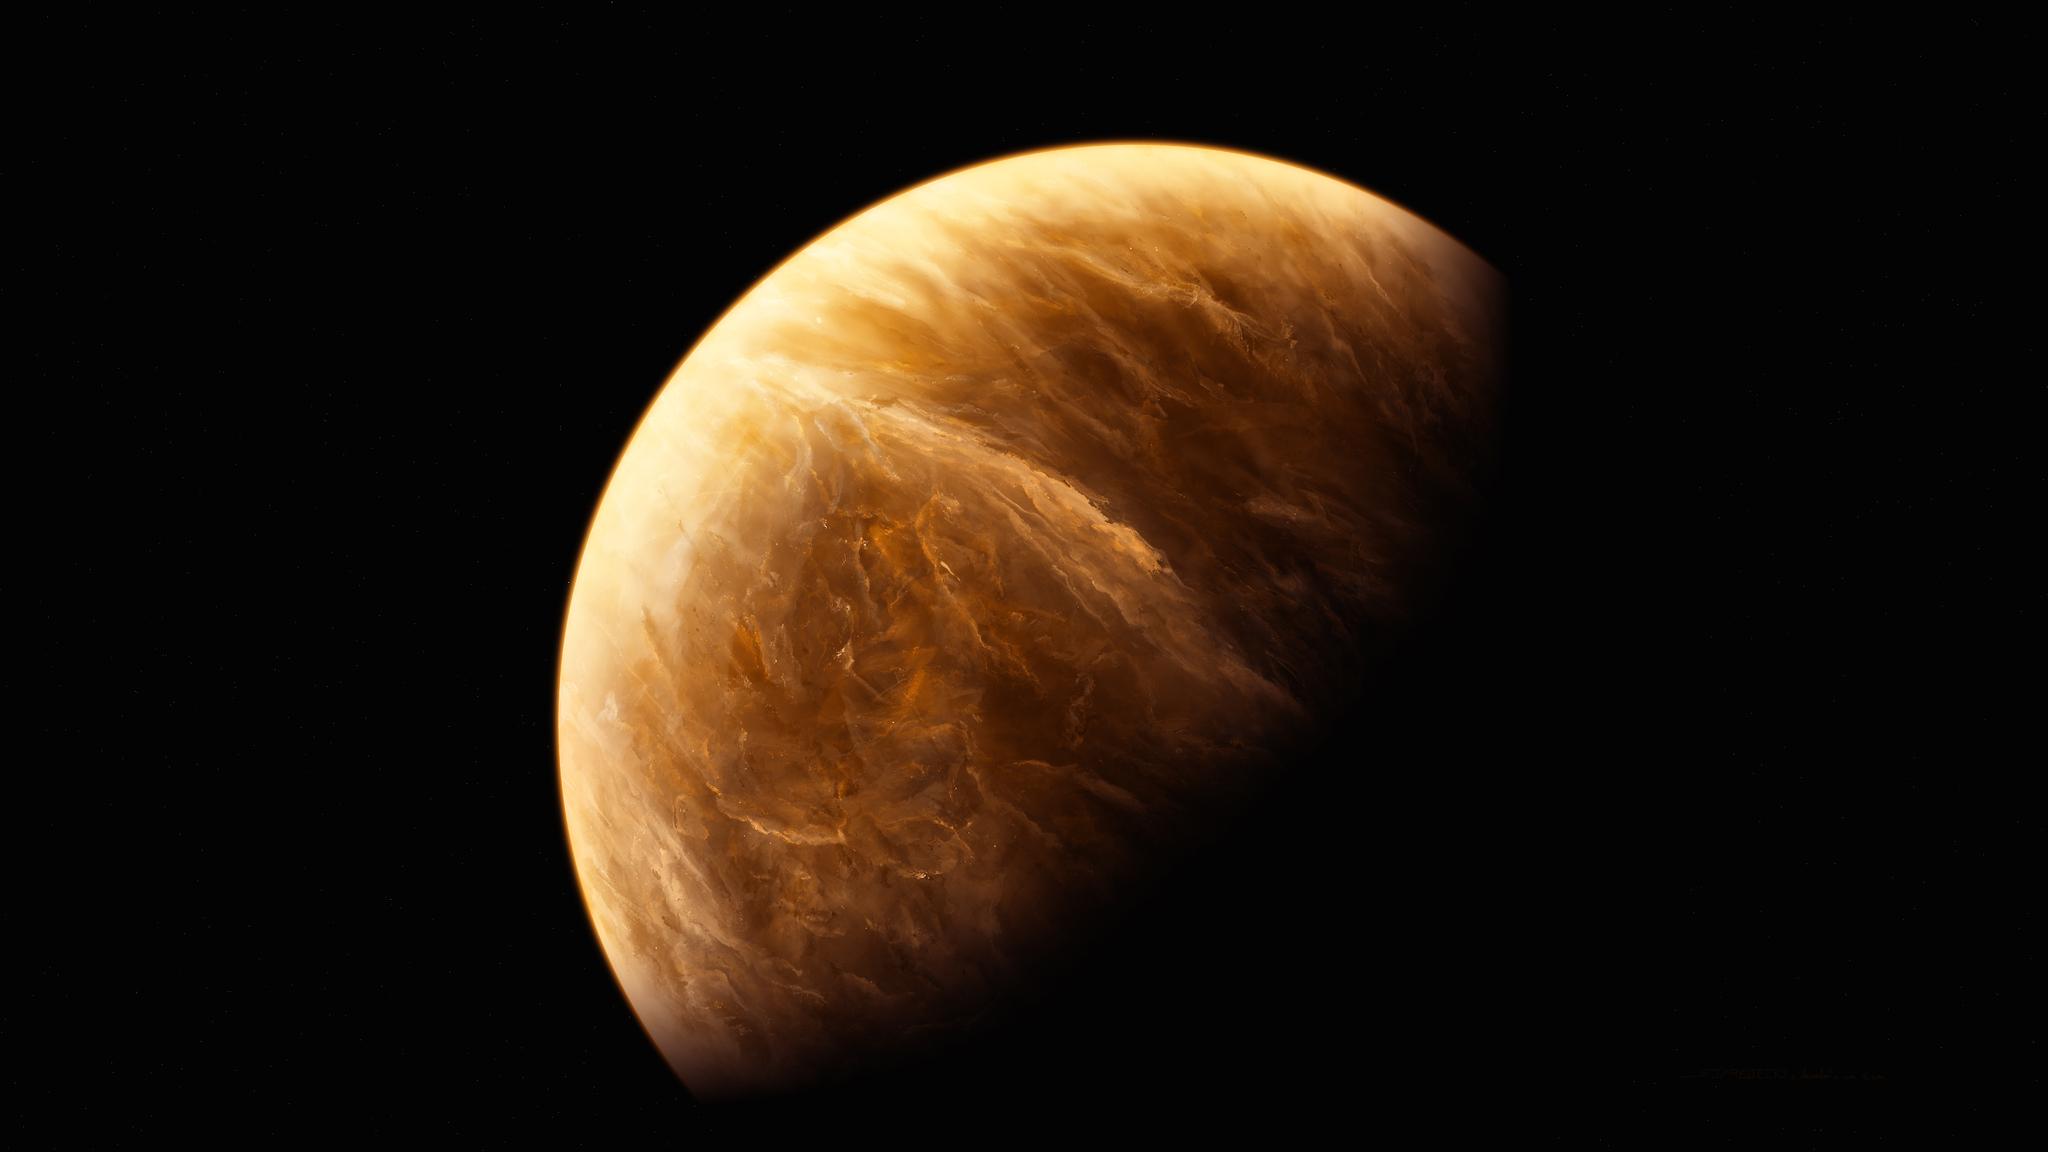 orange-planet-5k-gz.jpg